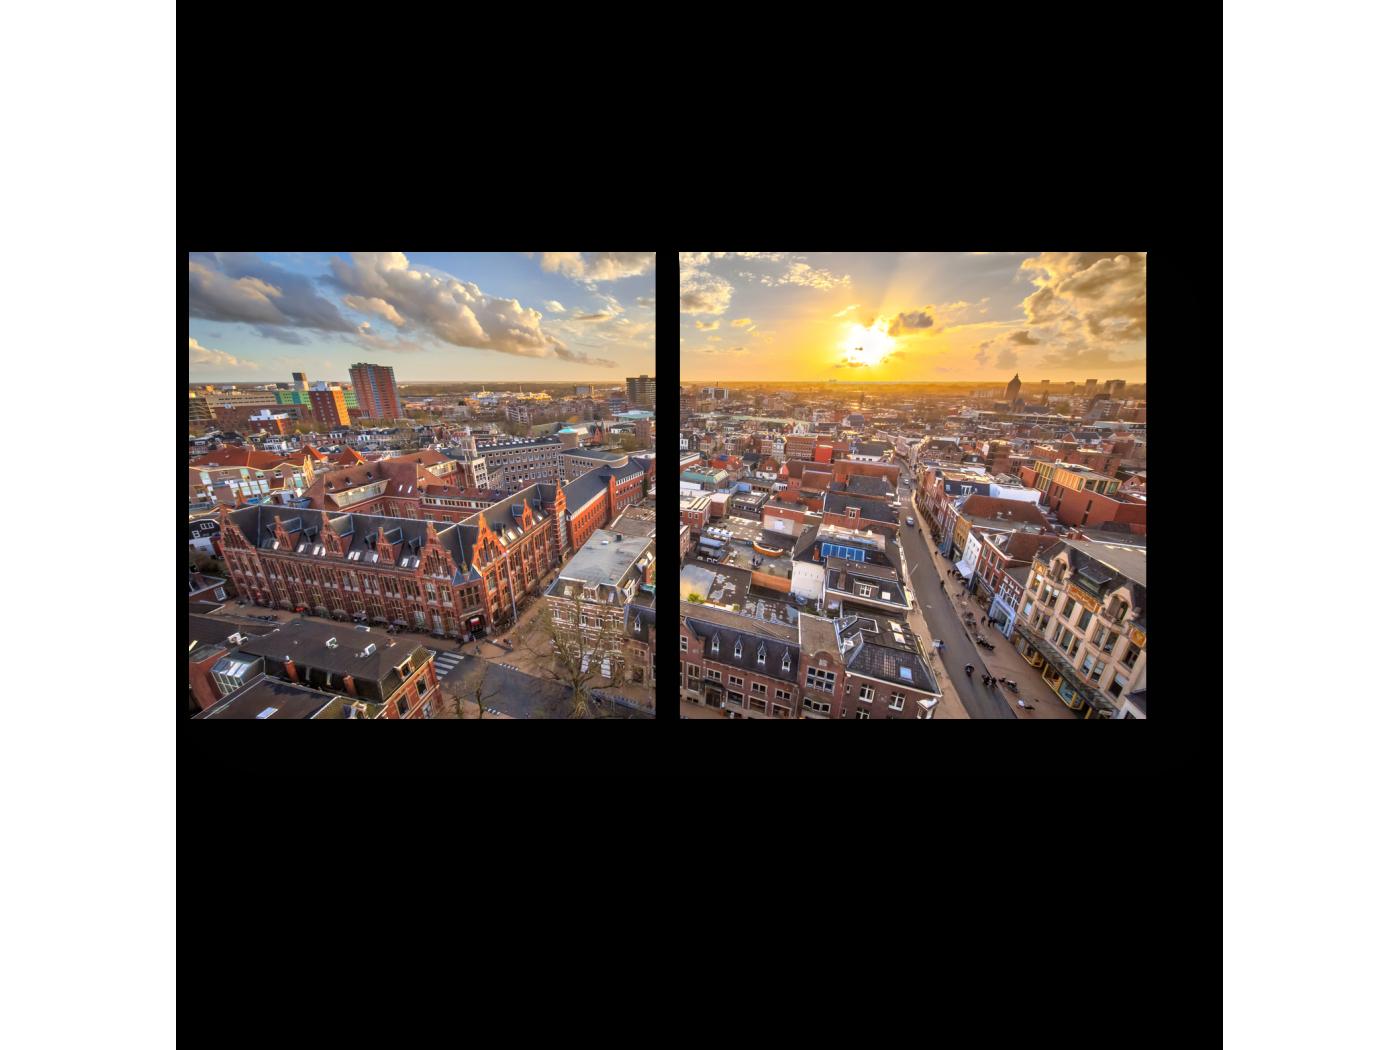 Модульная картина Чарующий Амстердам на закате. (40x20) фото